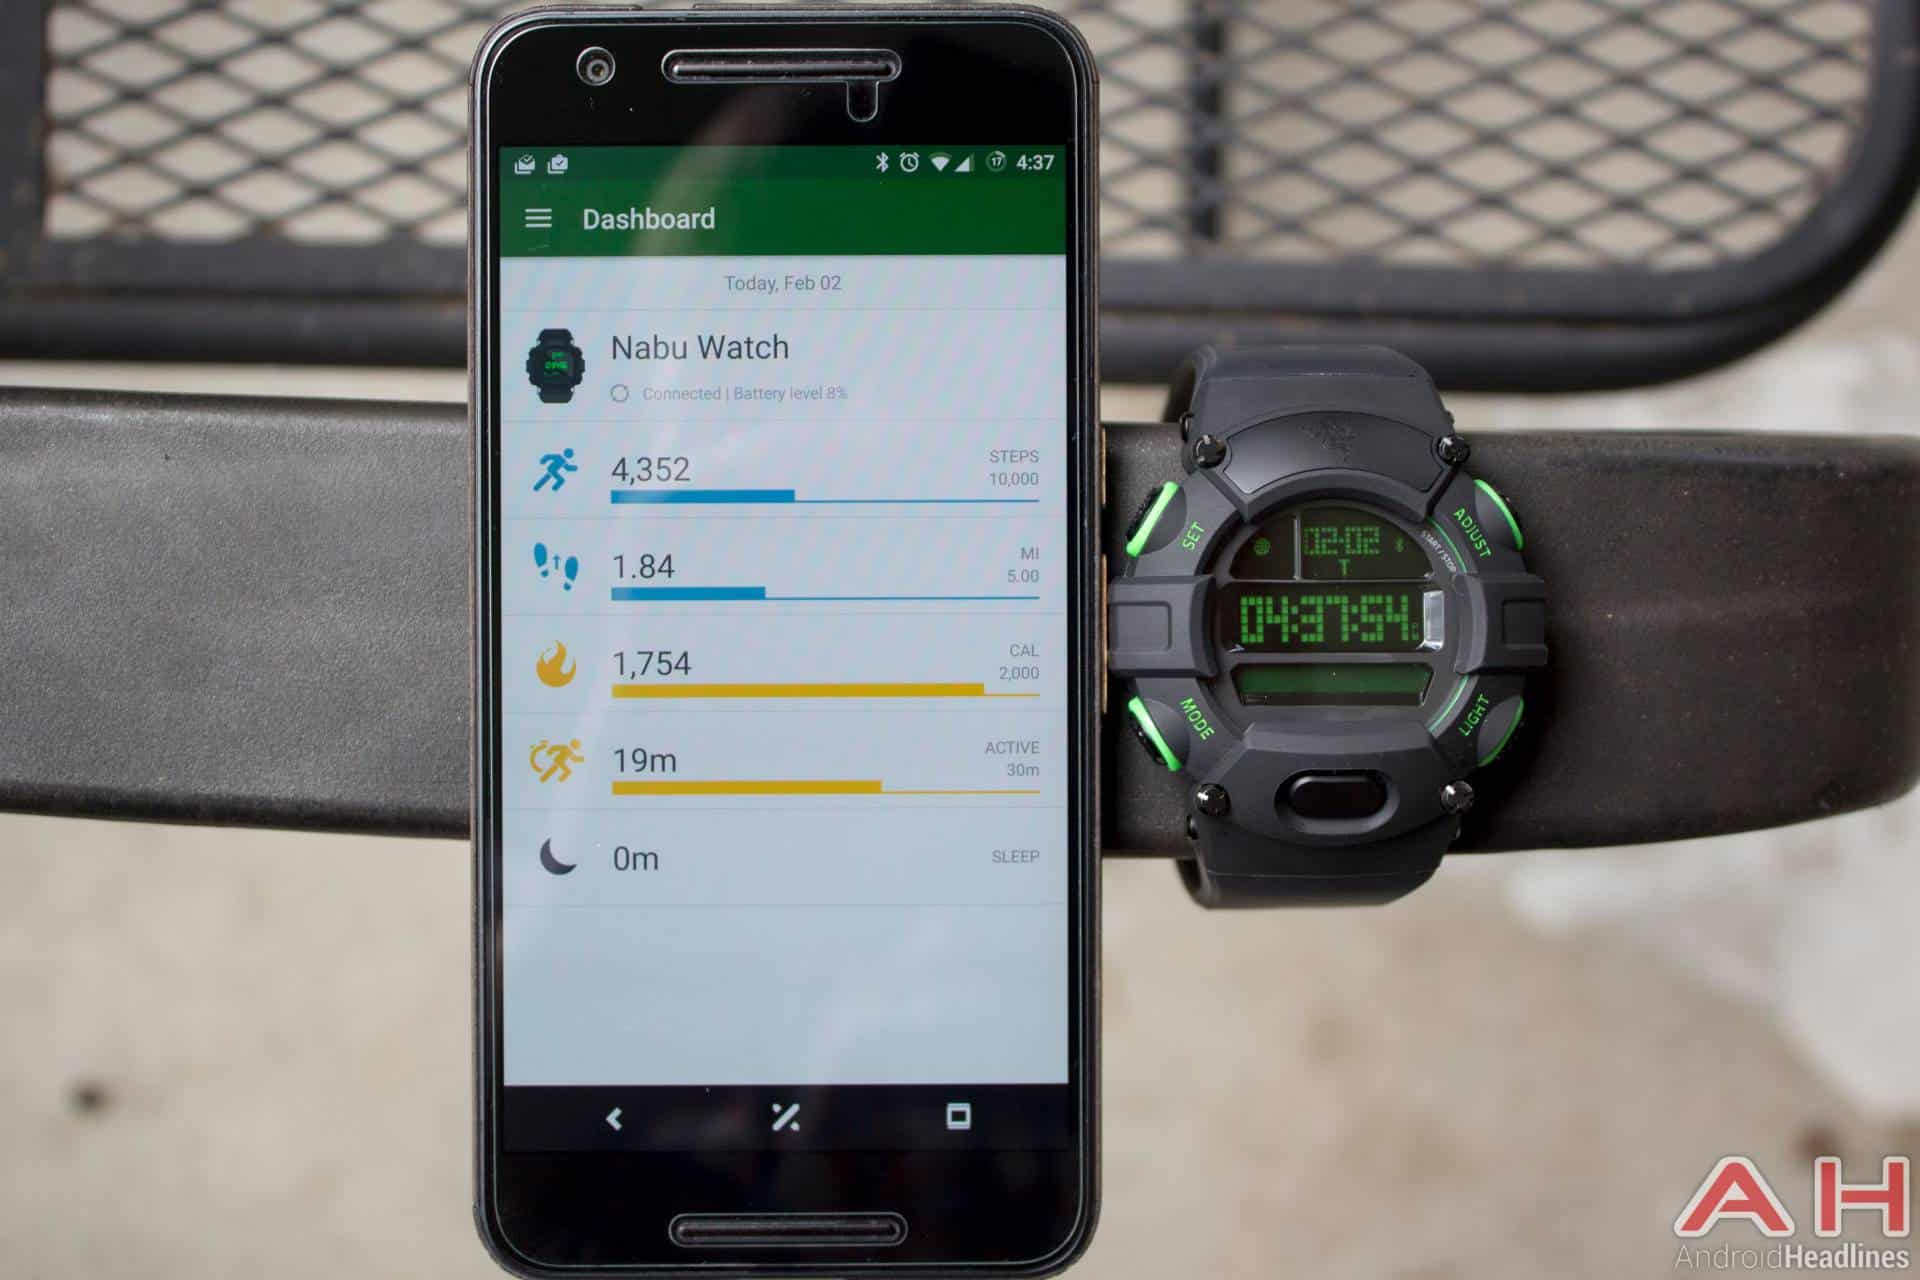 Razer-Nabu-Watch-AH-NS-app